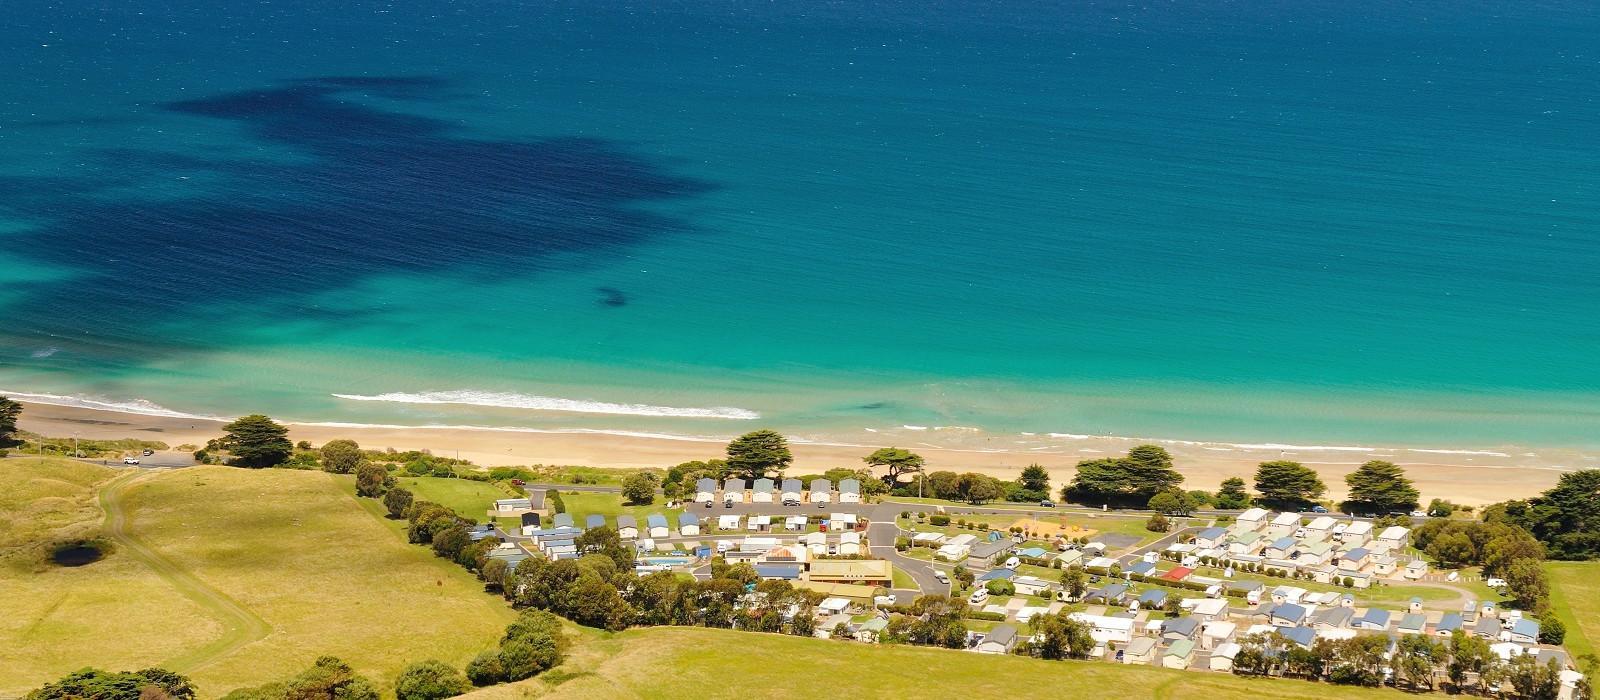 Australien – Roadtrip entlang der Great Southern Route Urlaub 1